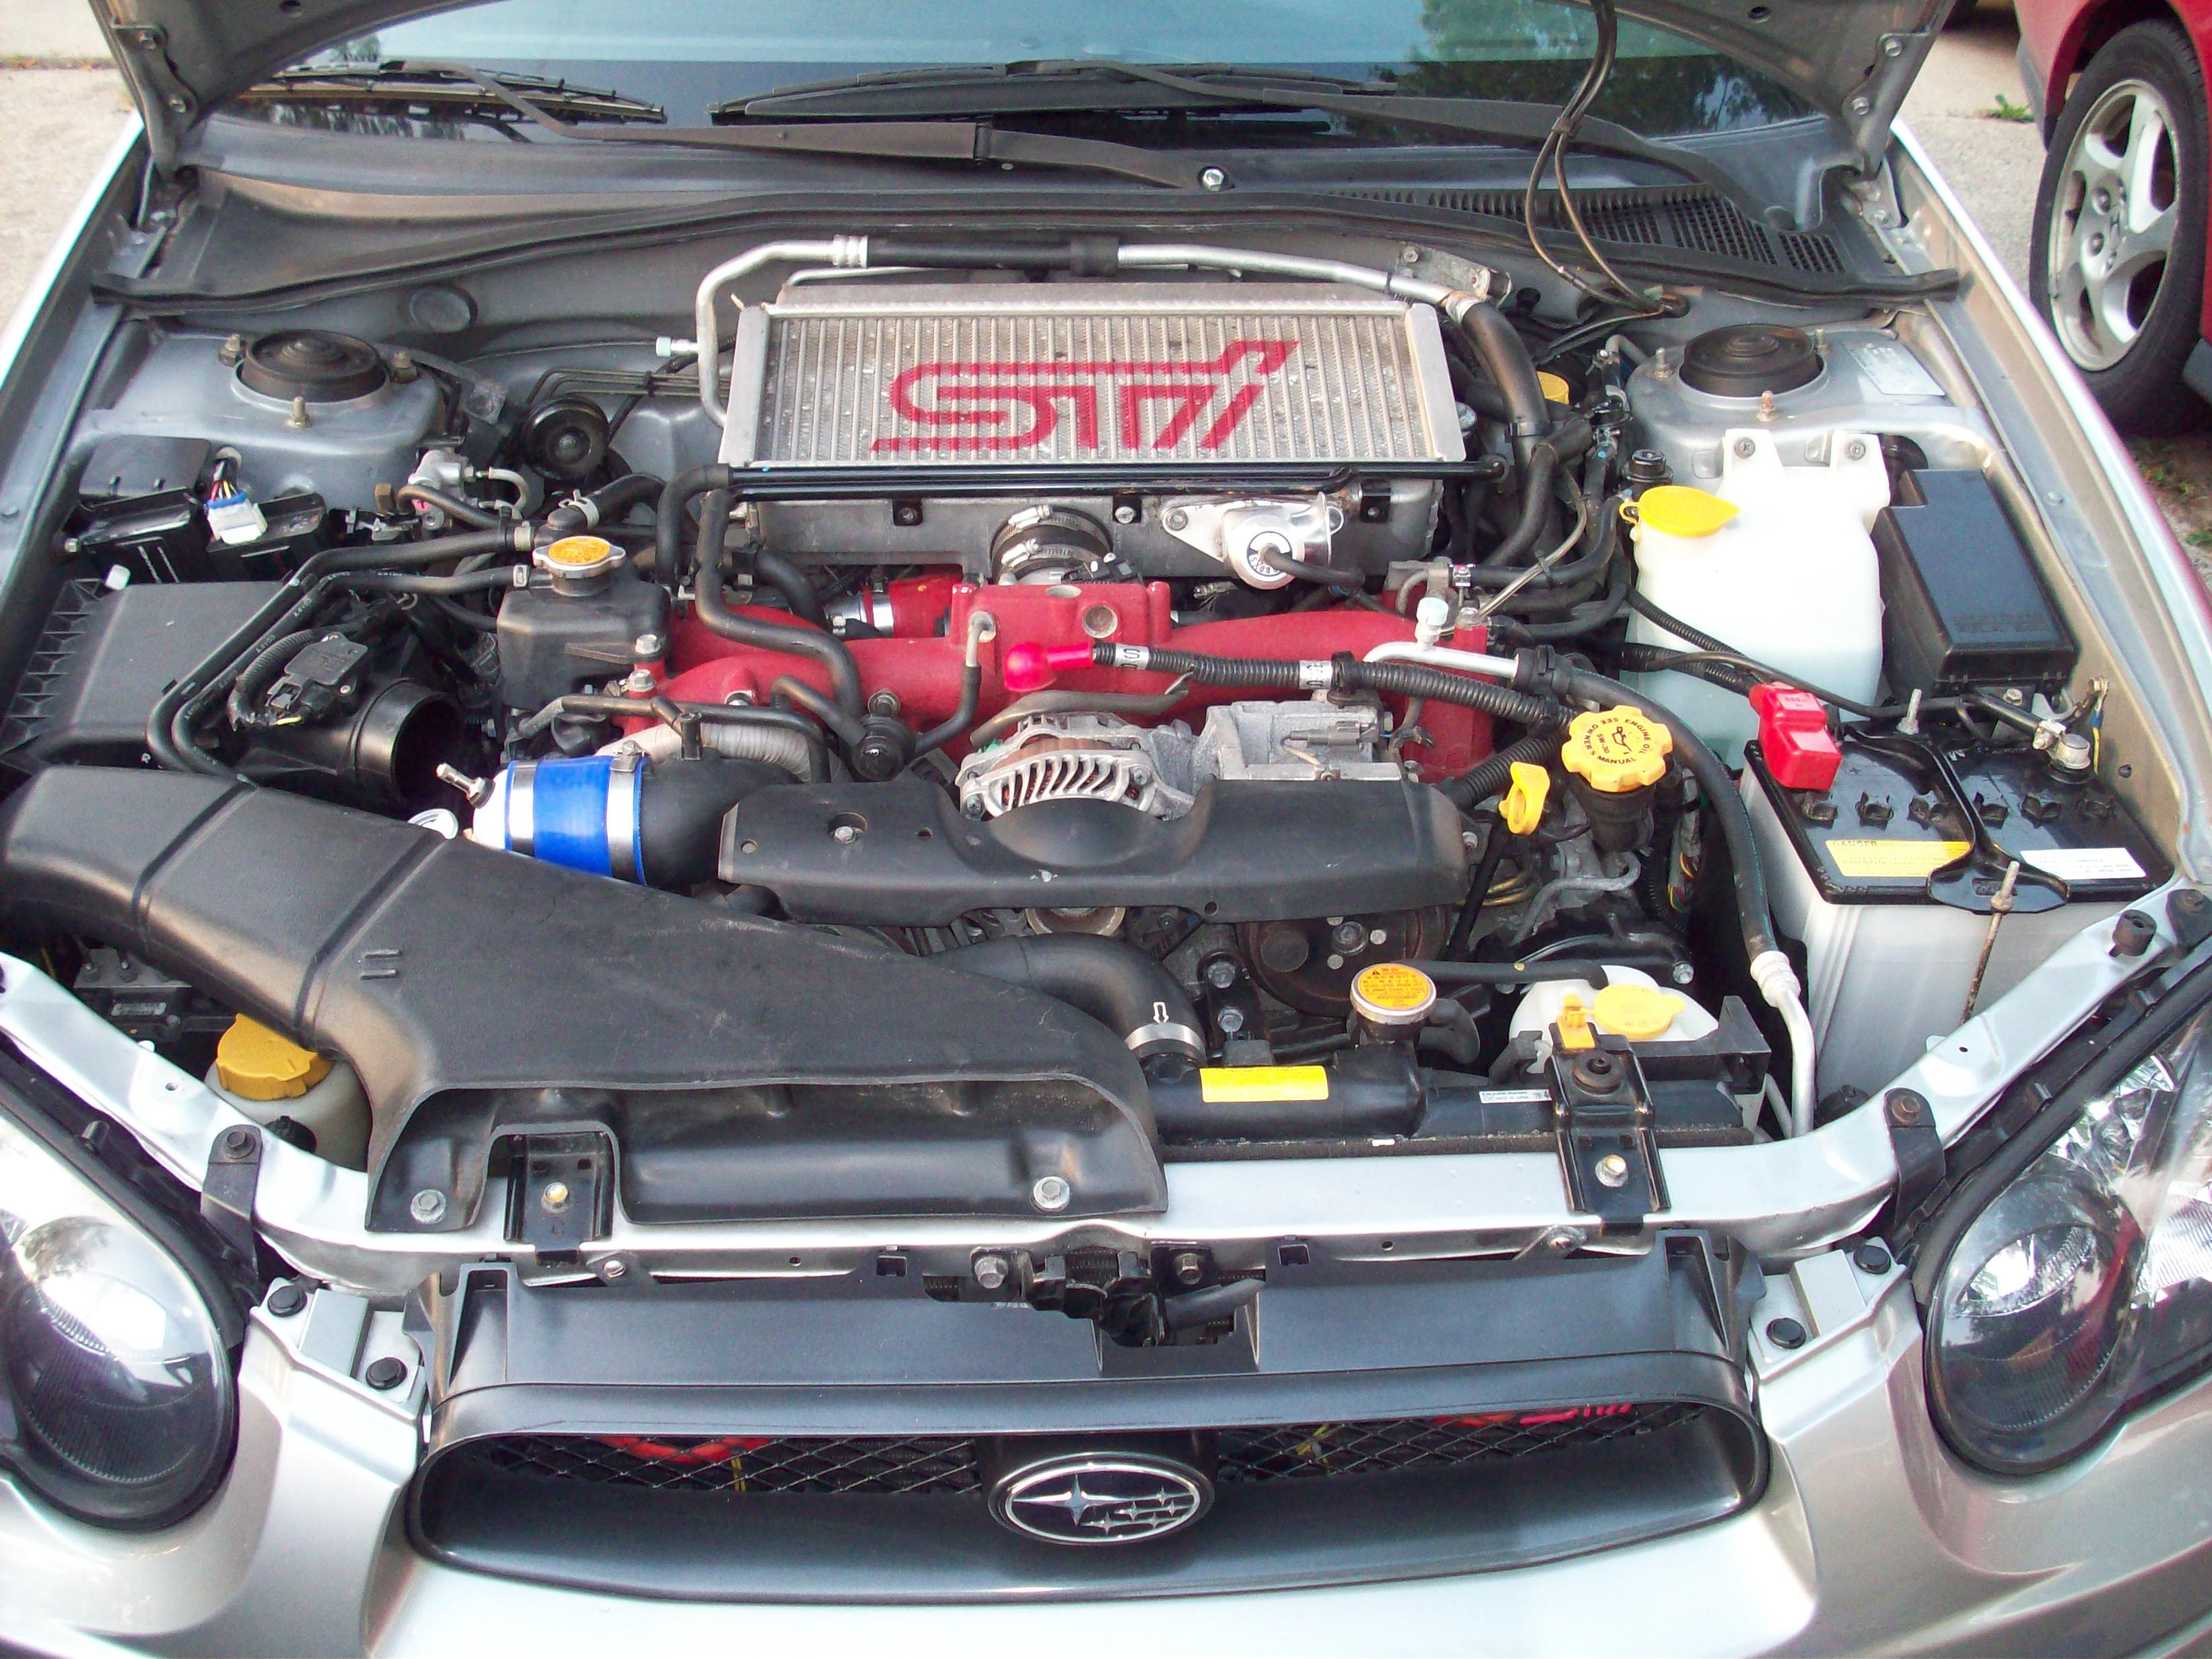 subaru1?t=1422674497 how to boostleak test a subaru Subaru Firing Order Diagram at creativeand.co